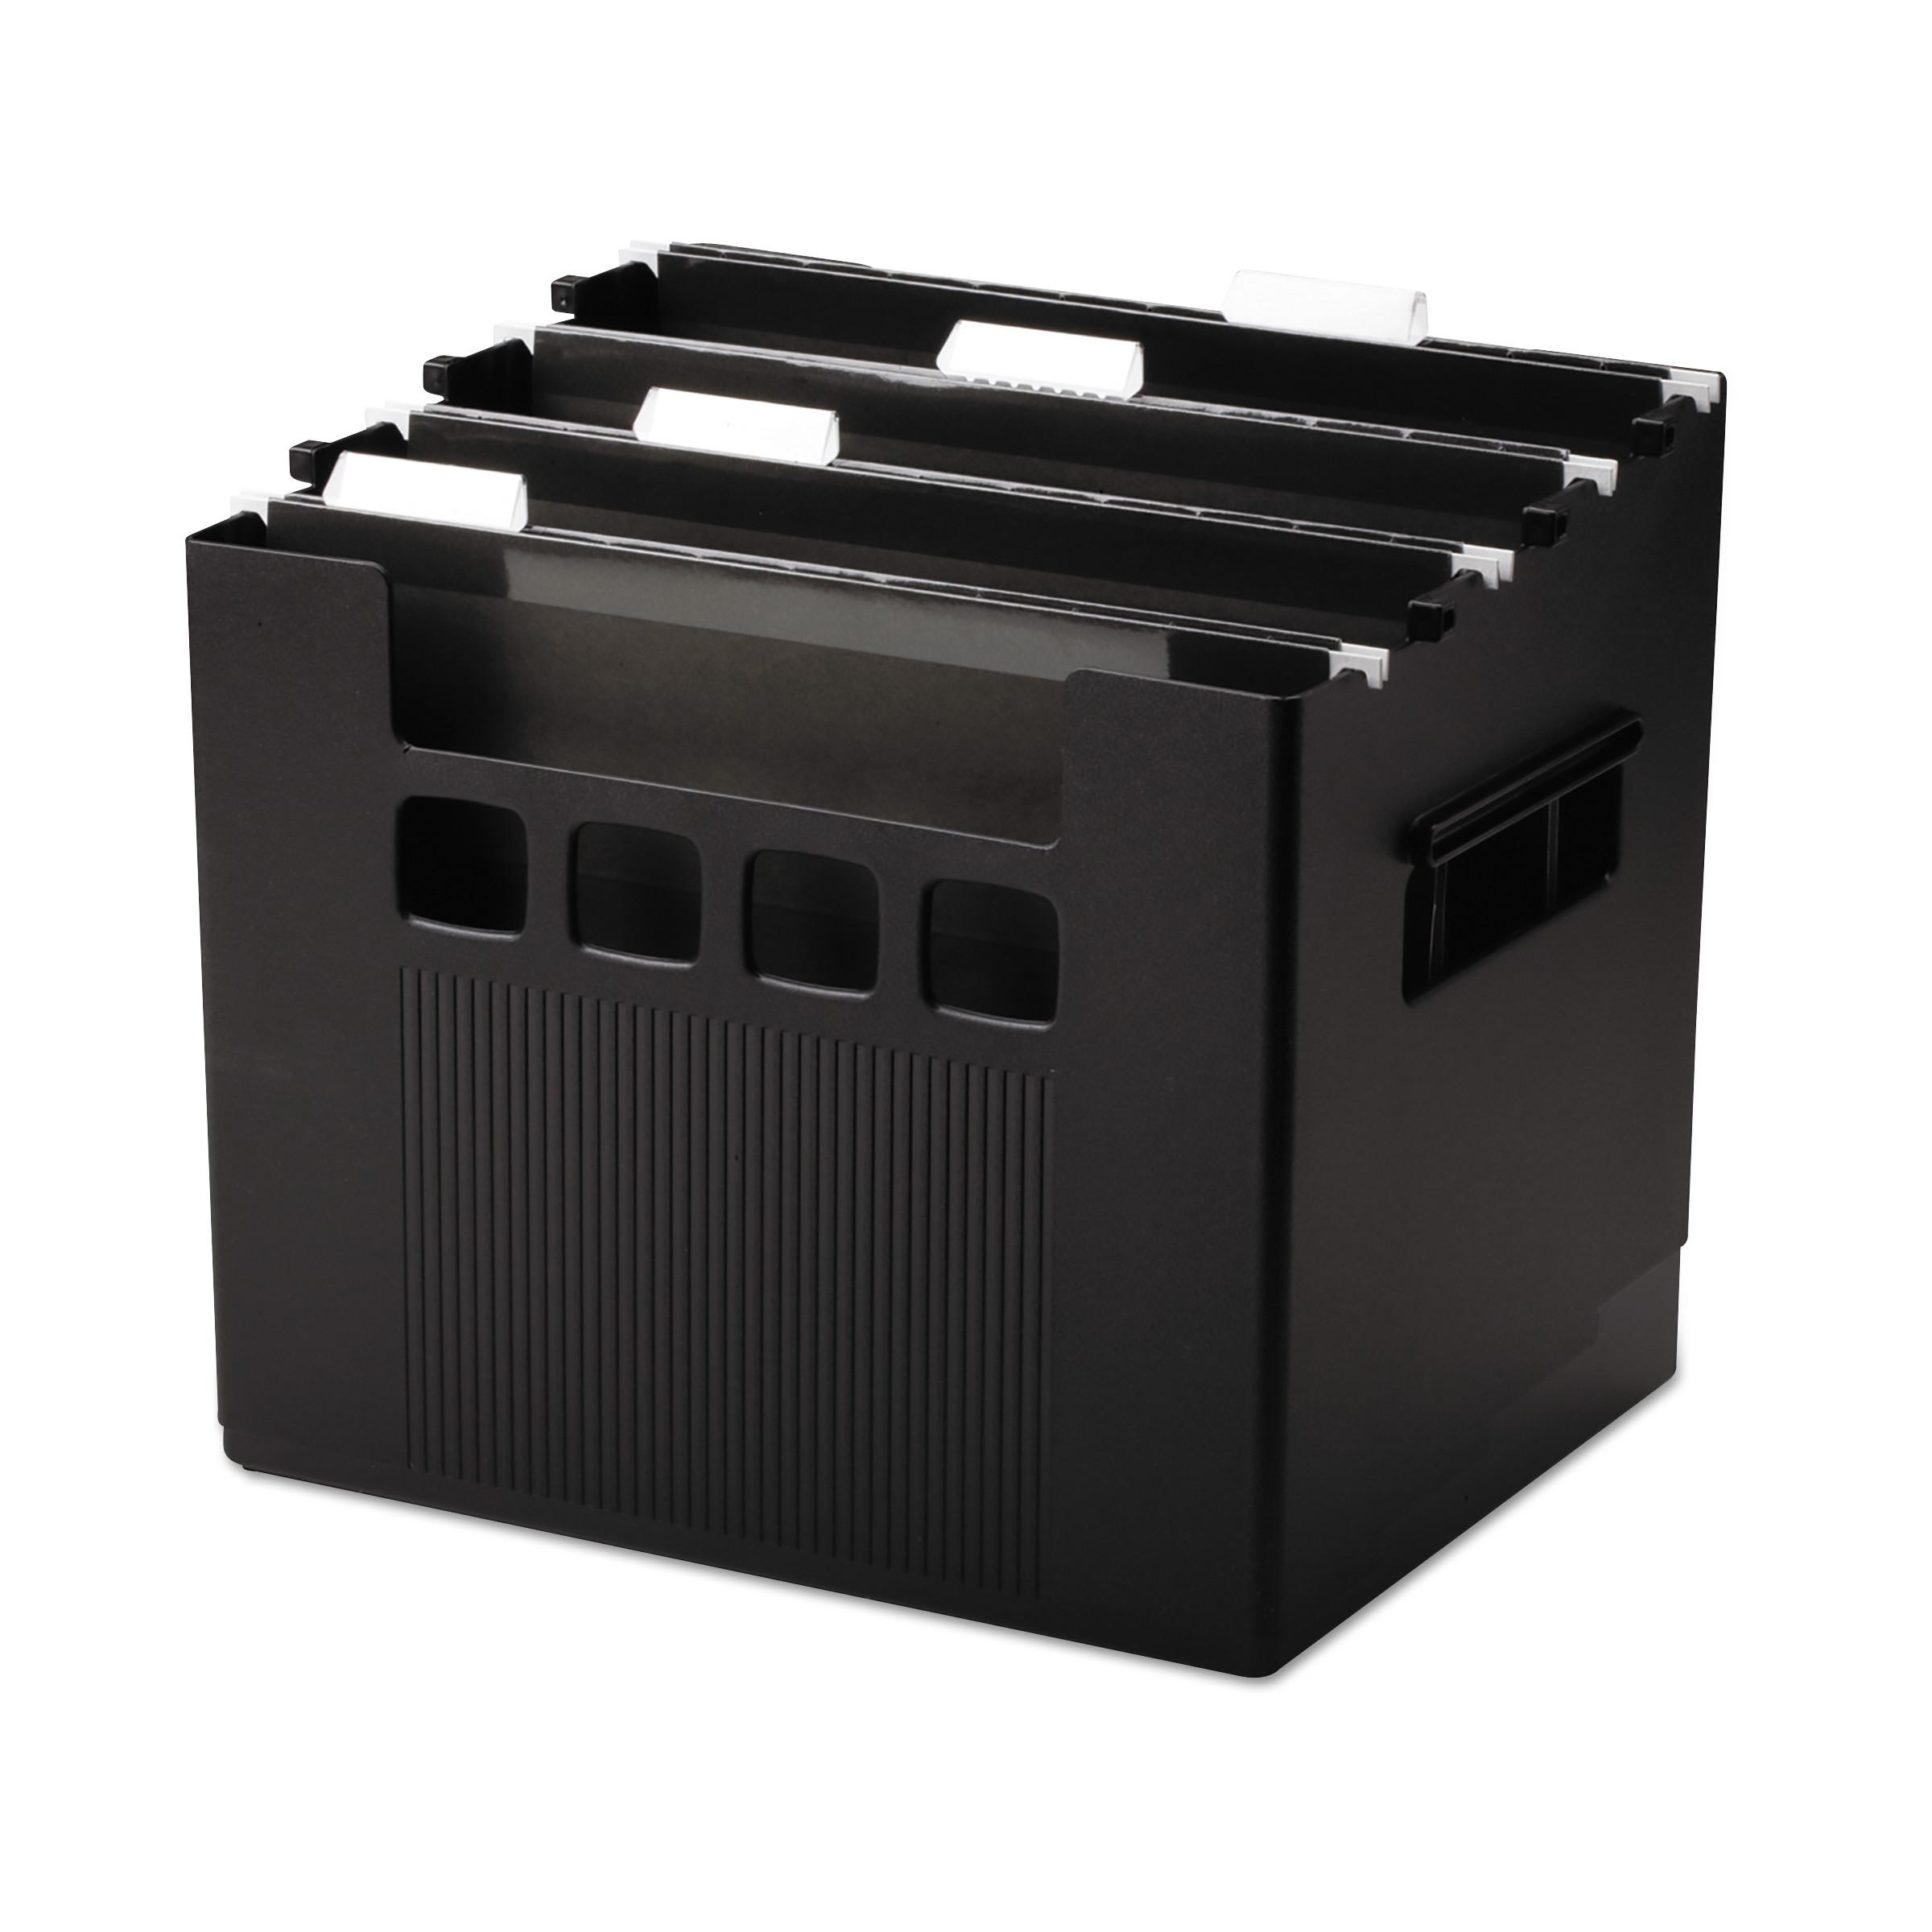 Desktop File w/Hanging Folders, Letter, Plastic, 12 3/4 x 10 x 11, Black